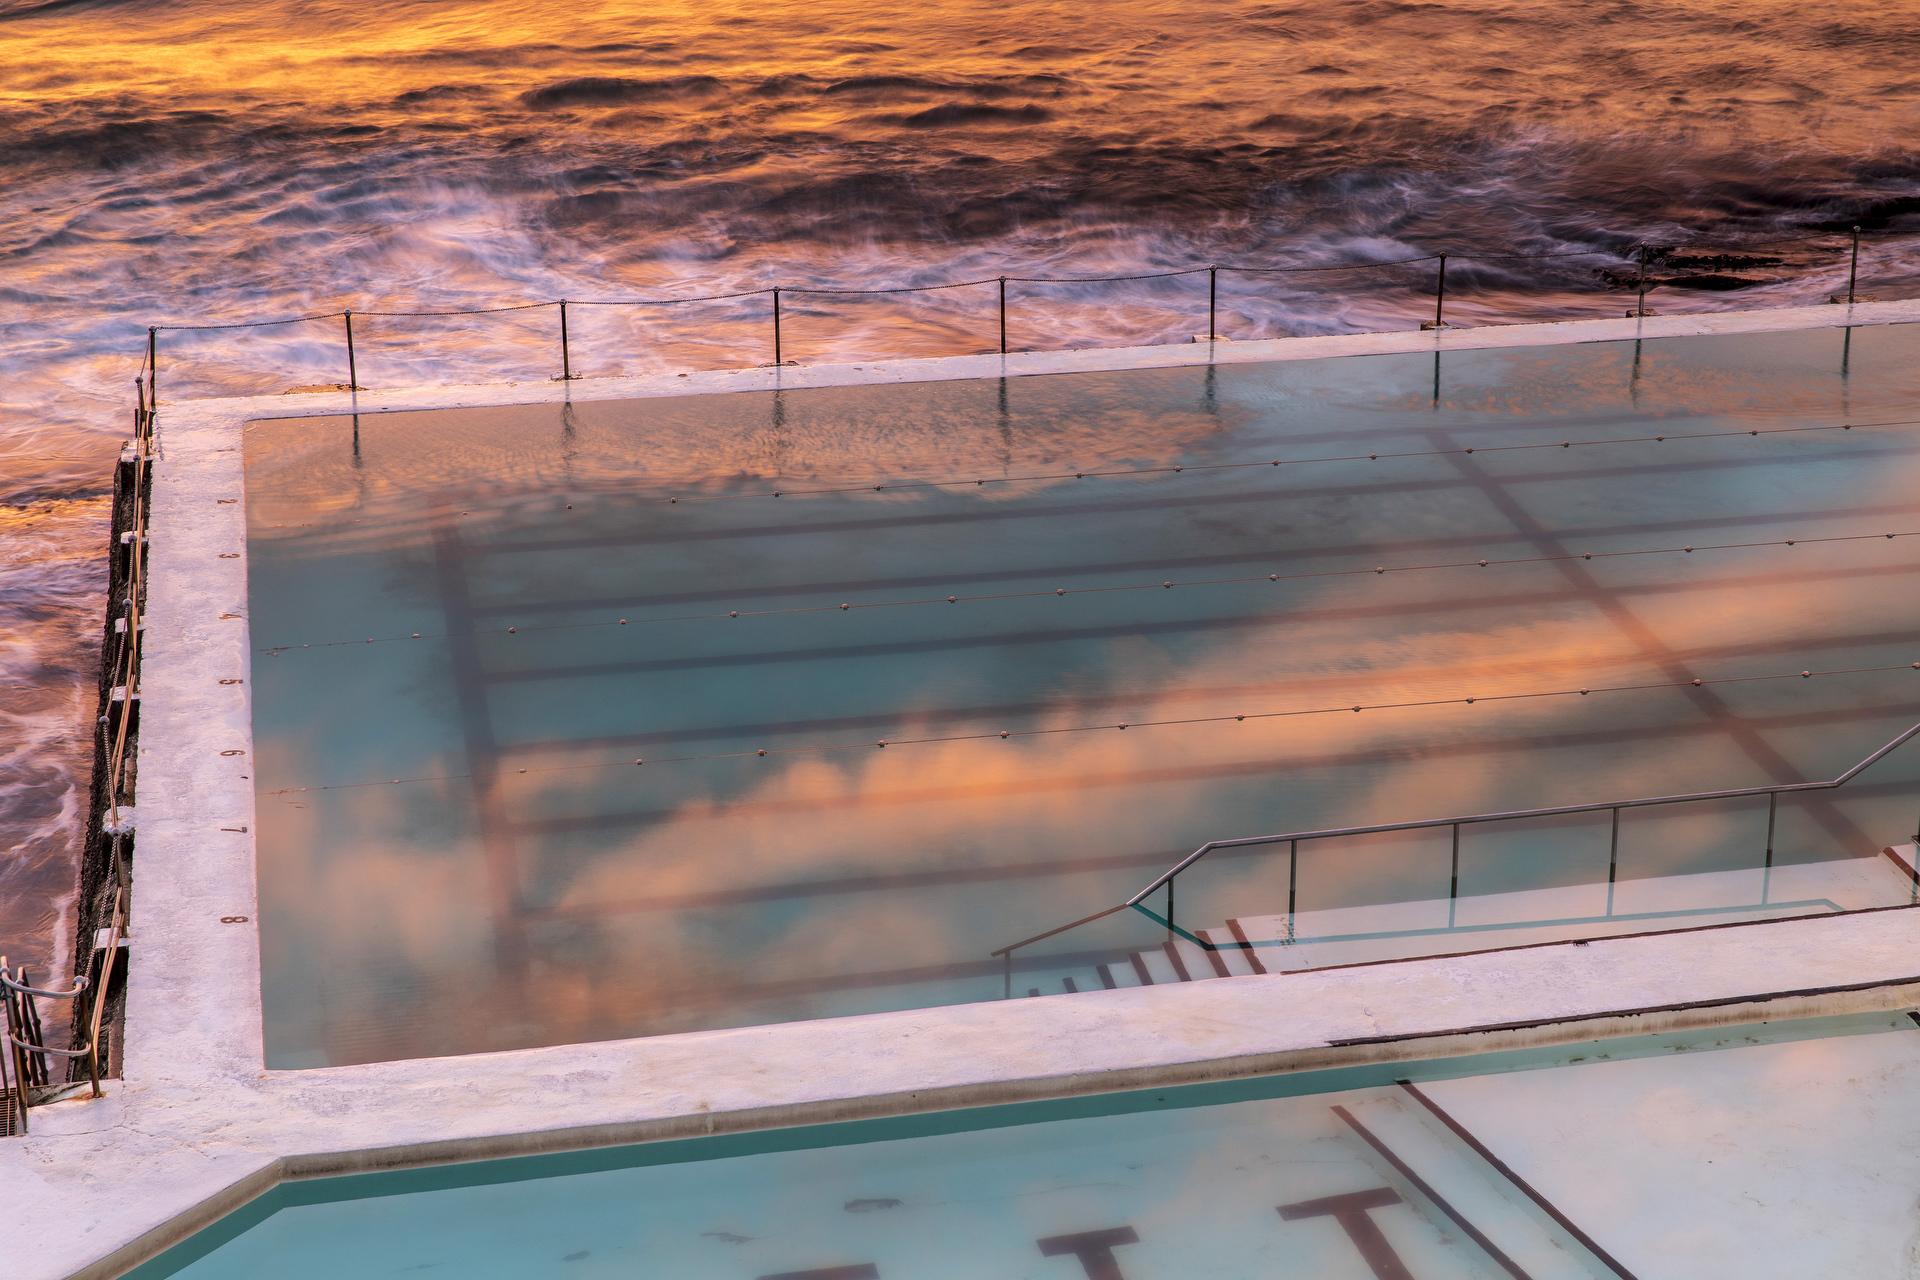 Sydney landscape photographer, sunrise, sunset, ocean, ocean pool, landscape, award winning, travel, NSW, Australia, sea, fine art prints, While you were sleeping, Bondi, icebergs